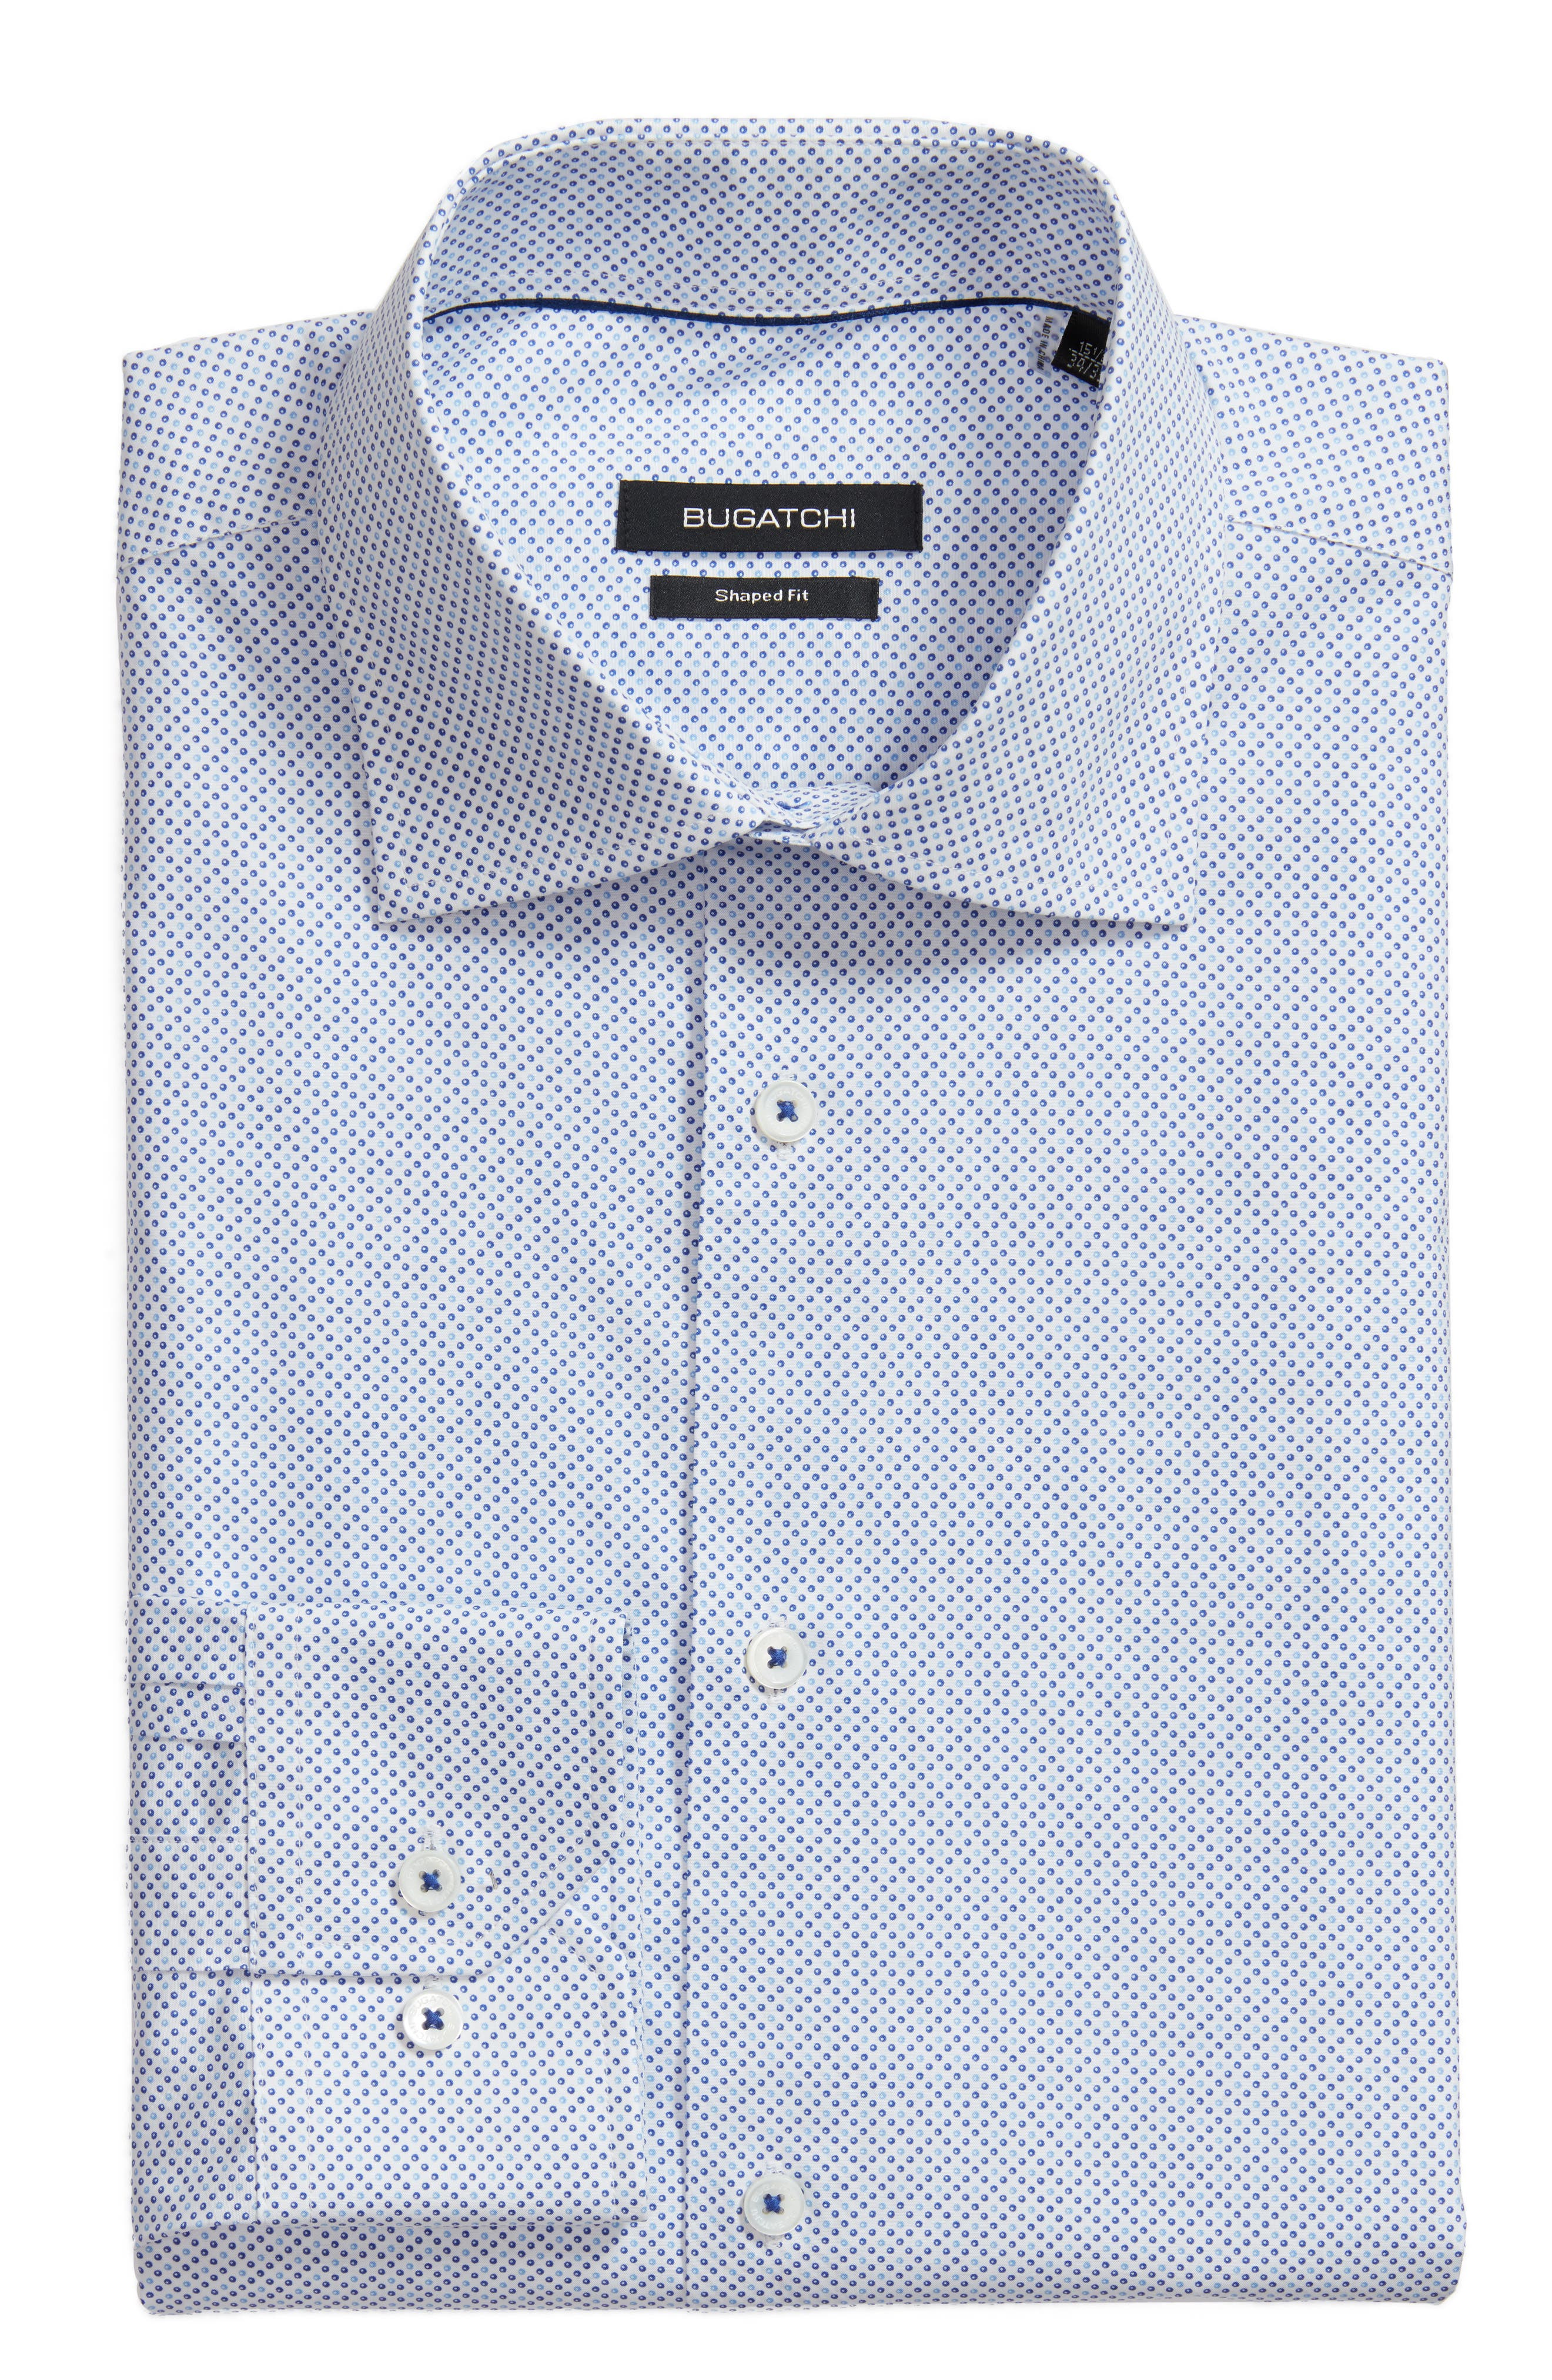 Trim Fit Dot Dress Shirt,                             Main thumbnail 1, color,                             422